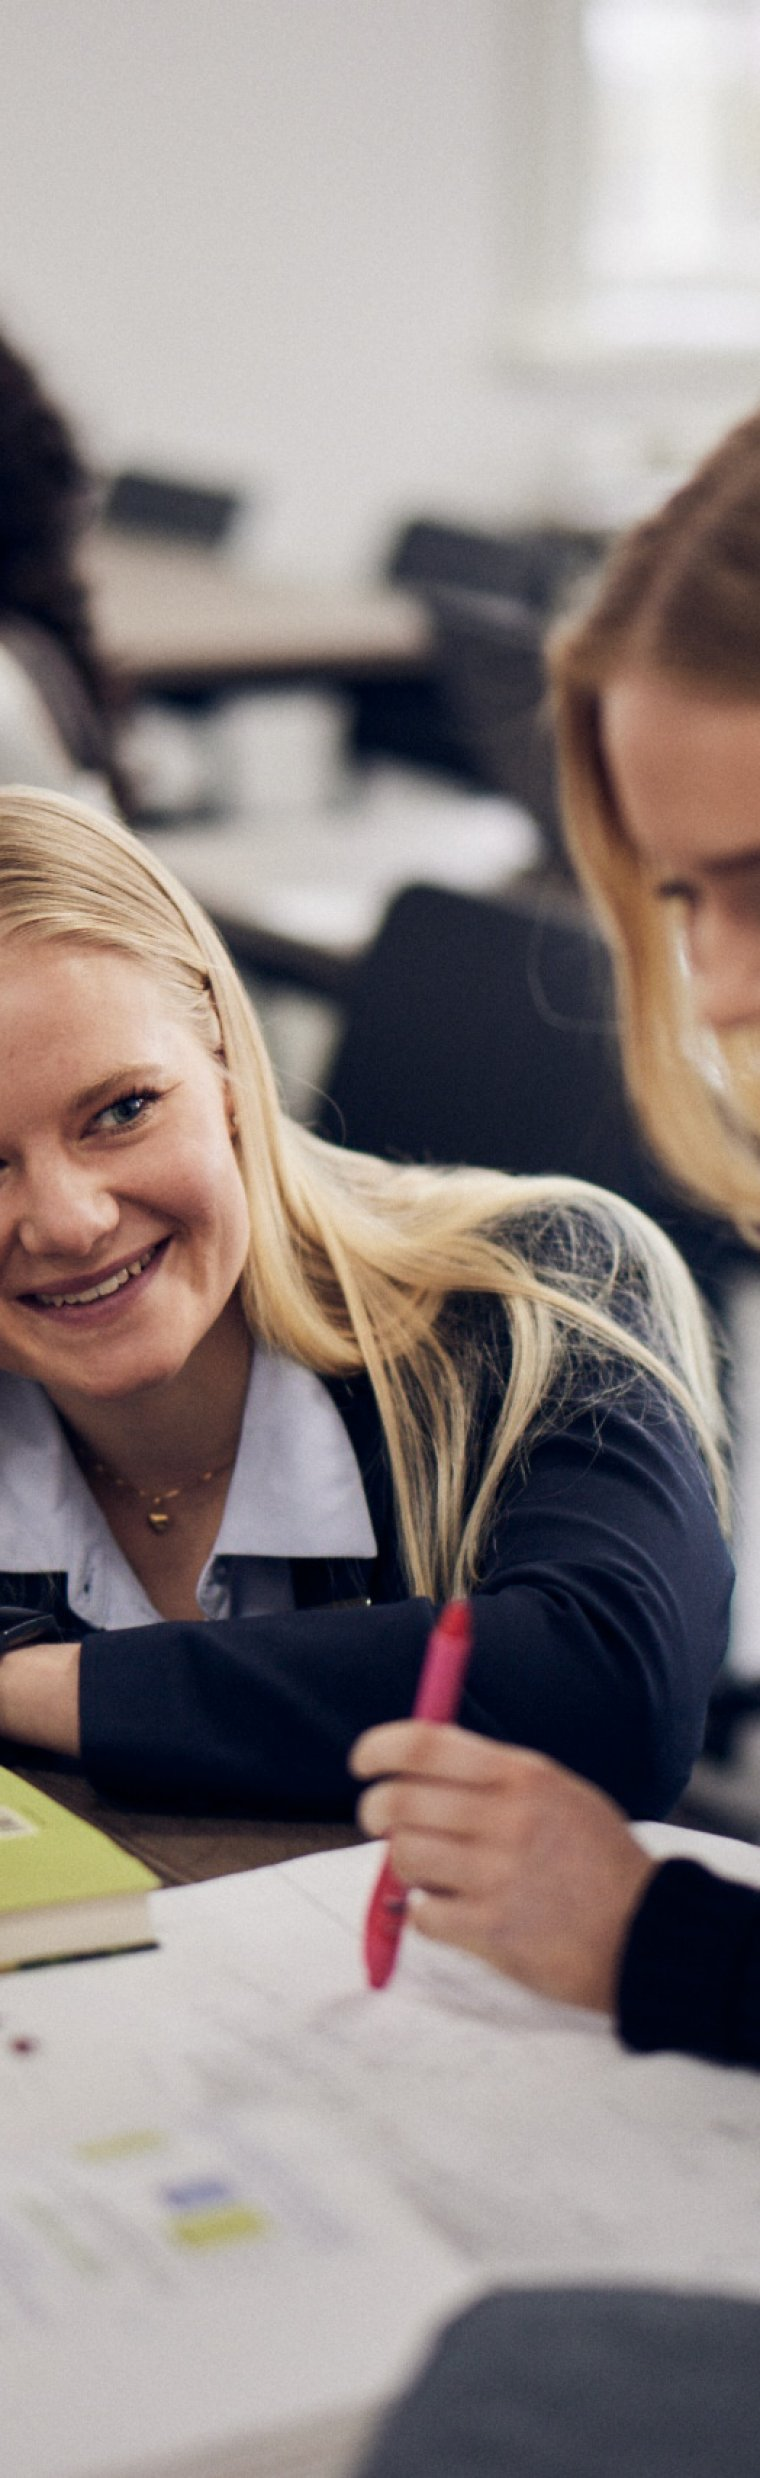 Elever studerar på lektion i Procivitas Gymnasium Uppsala.